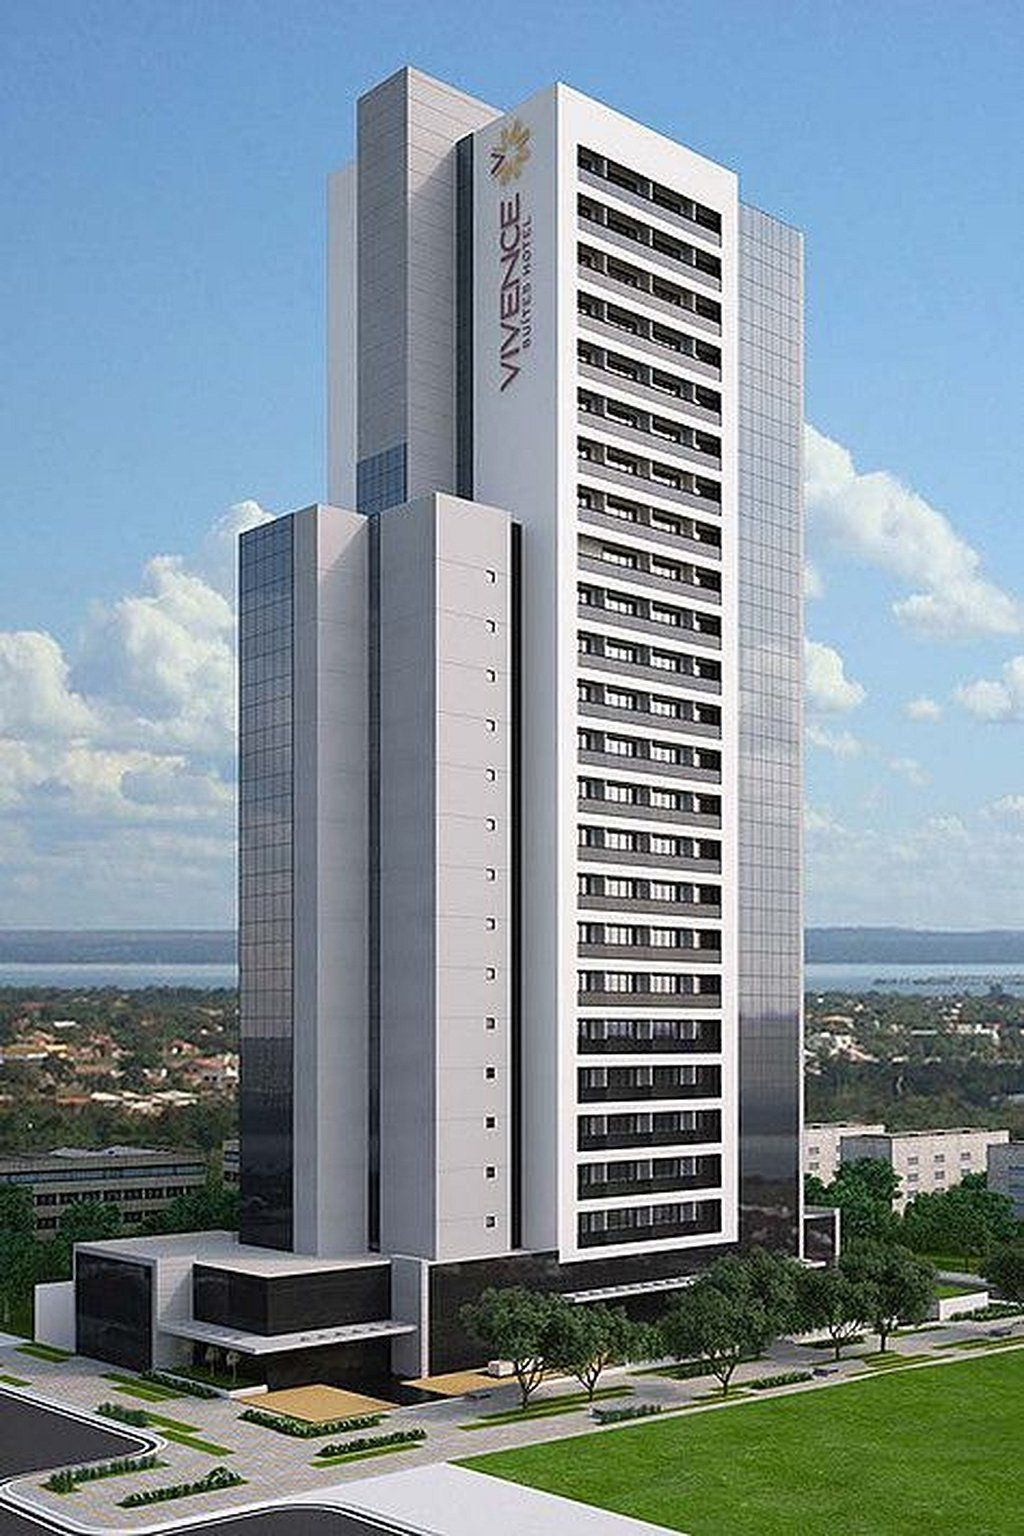 Hotels Design Architecture Buildings